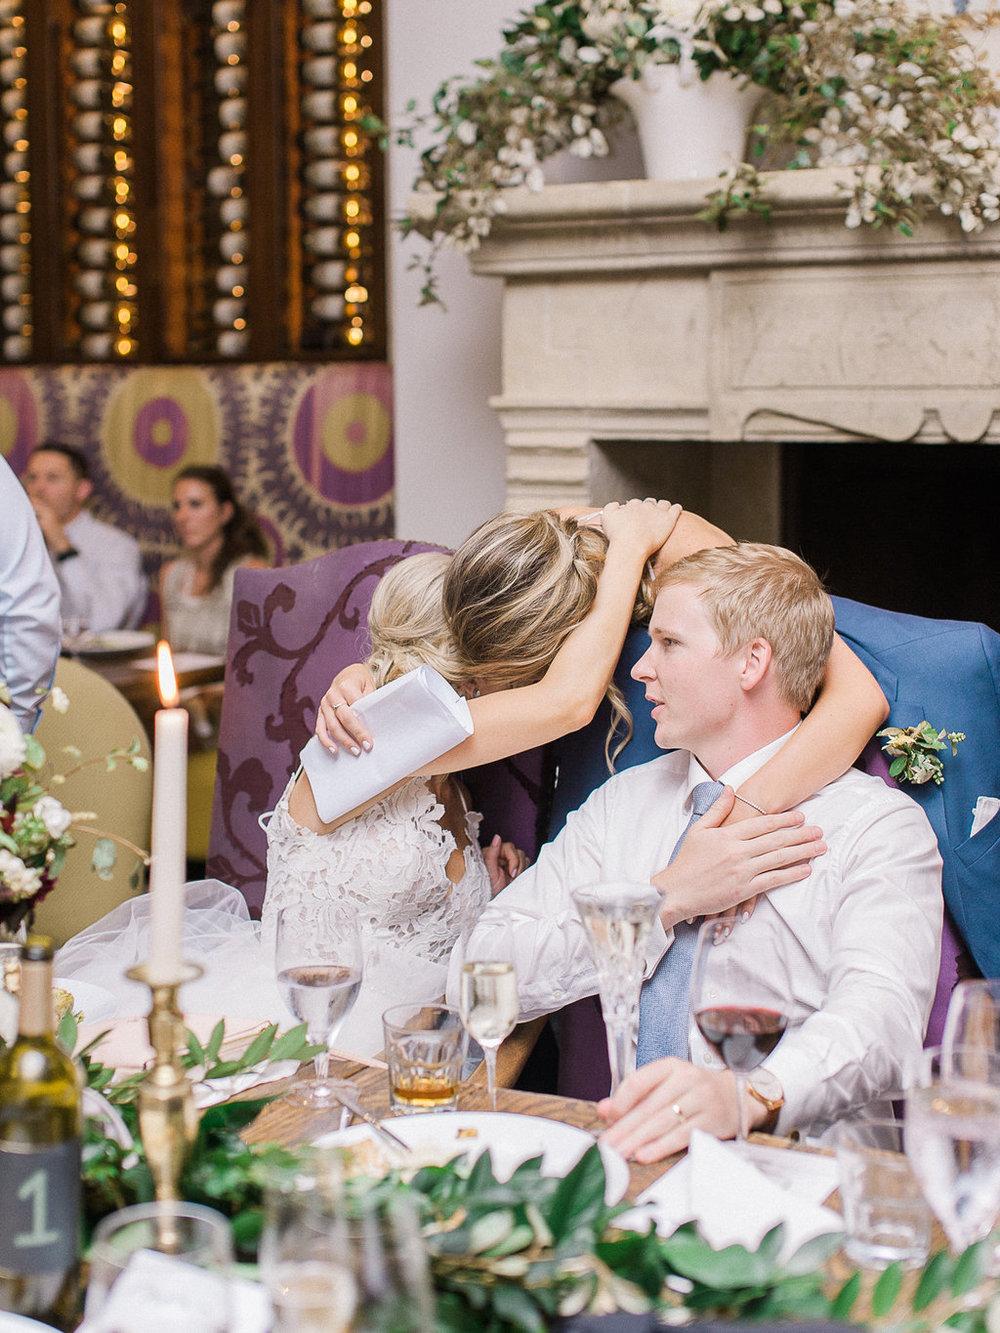 montaluce-winery-dahlonega-atlanta-wedding-photographer-fine-art-film-hannah-forsberg66.JPG